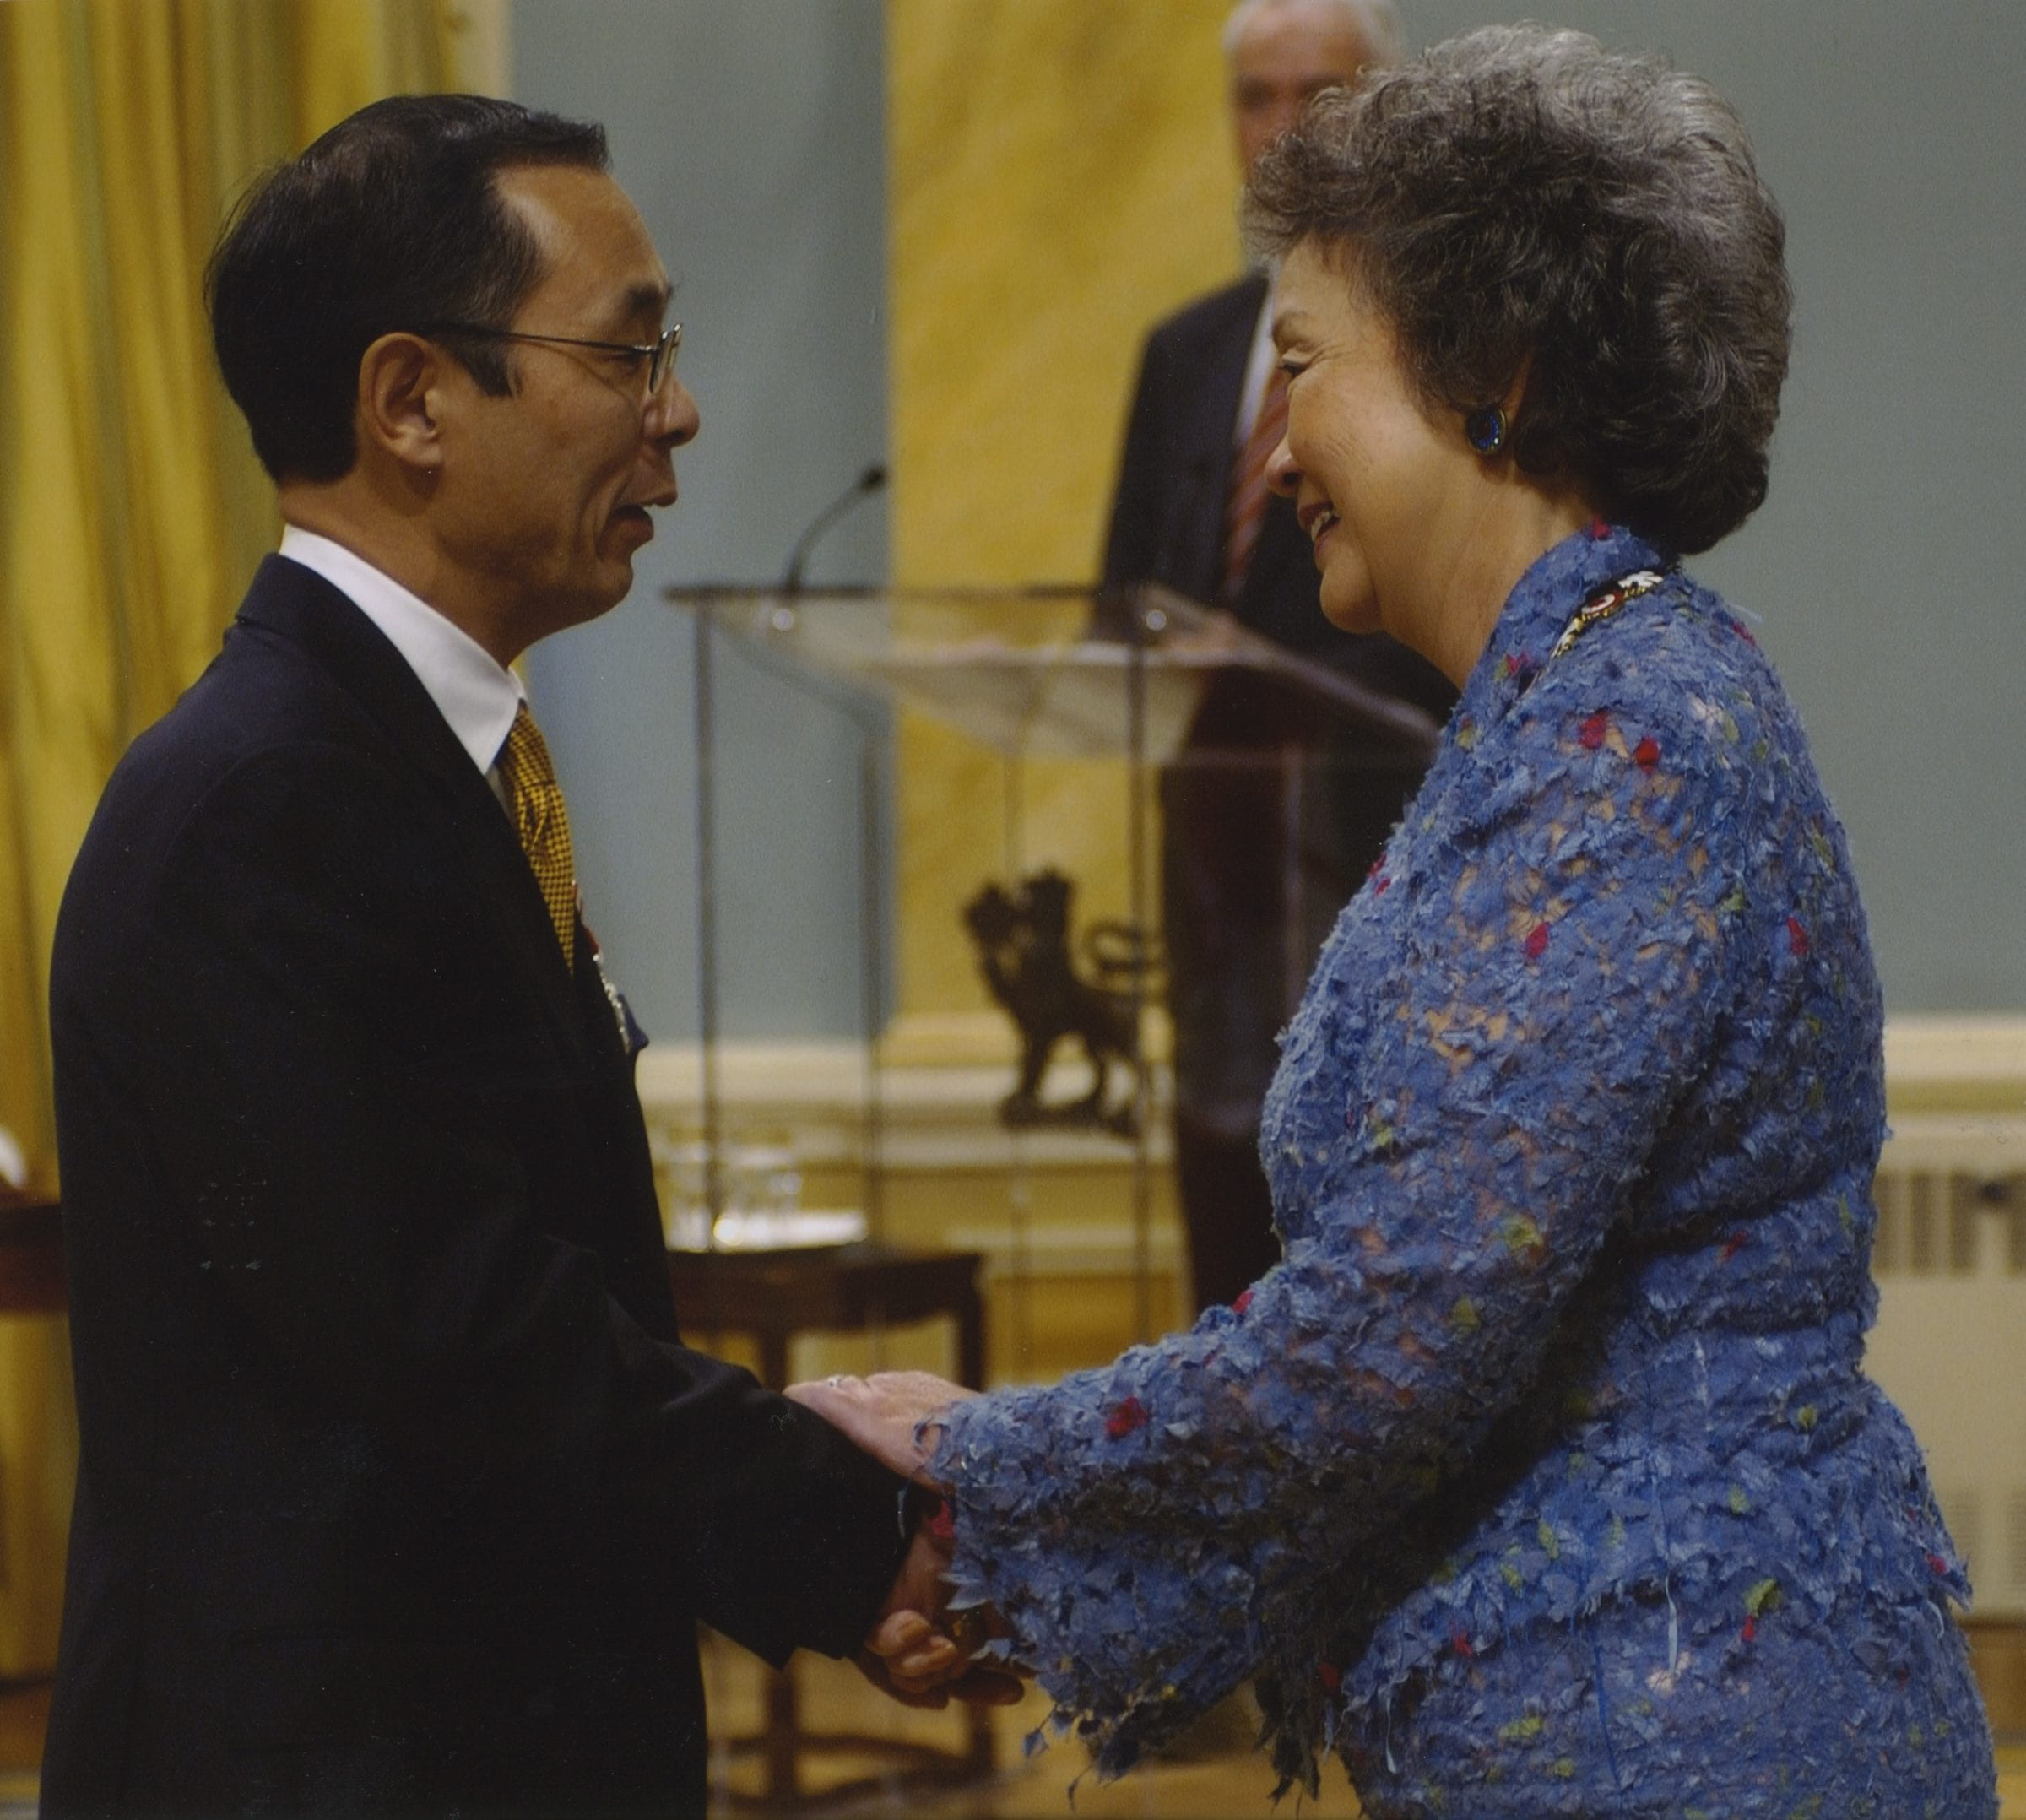 Takashi Murakami with Adrienne Clarkson